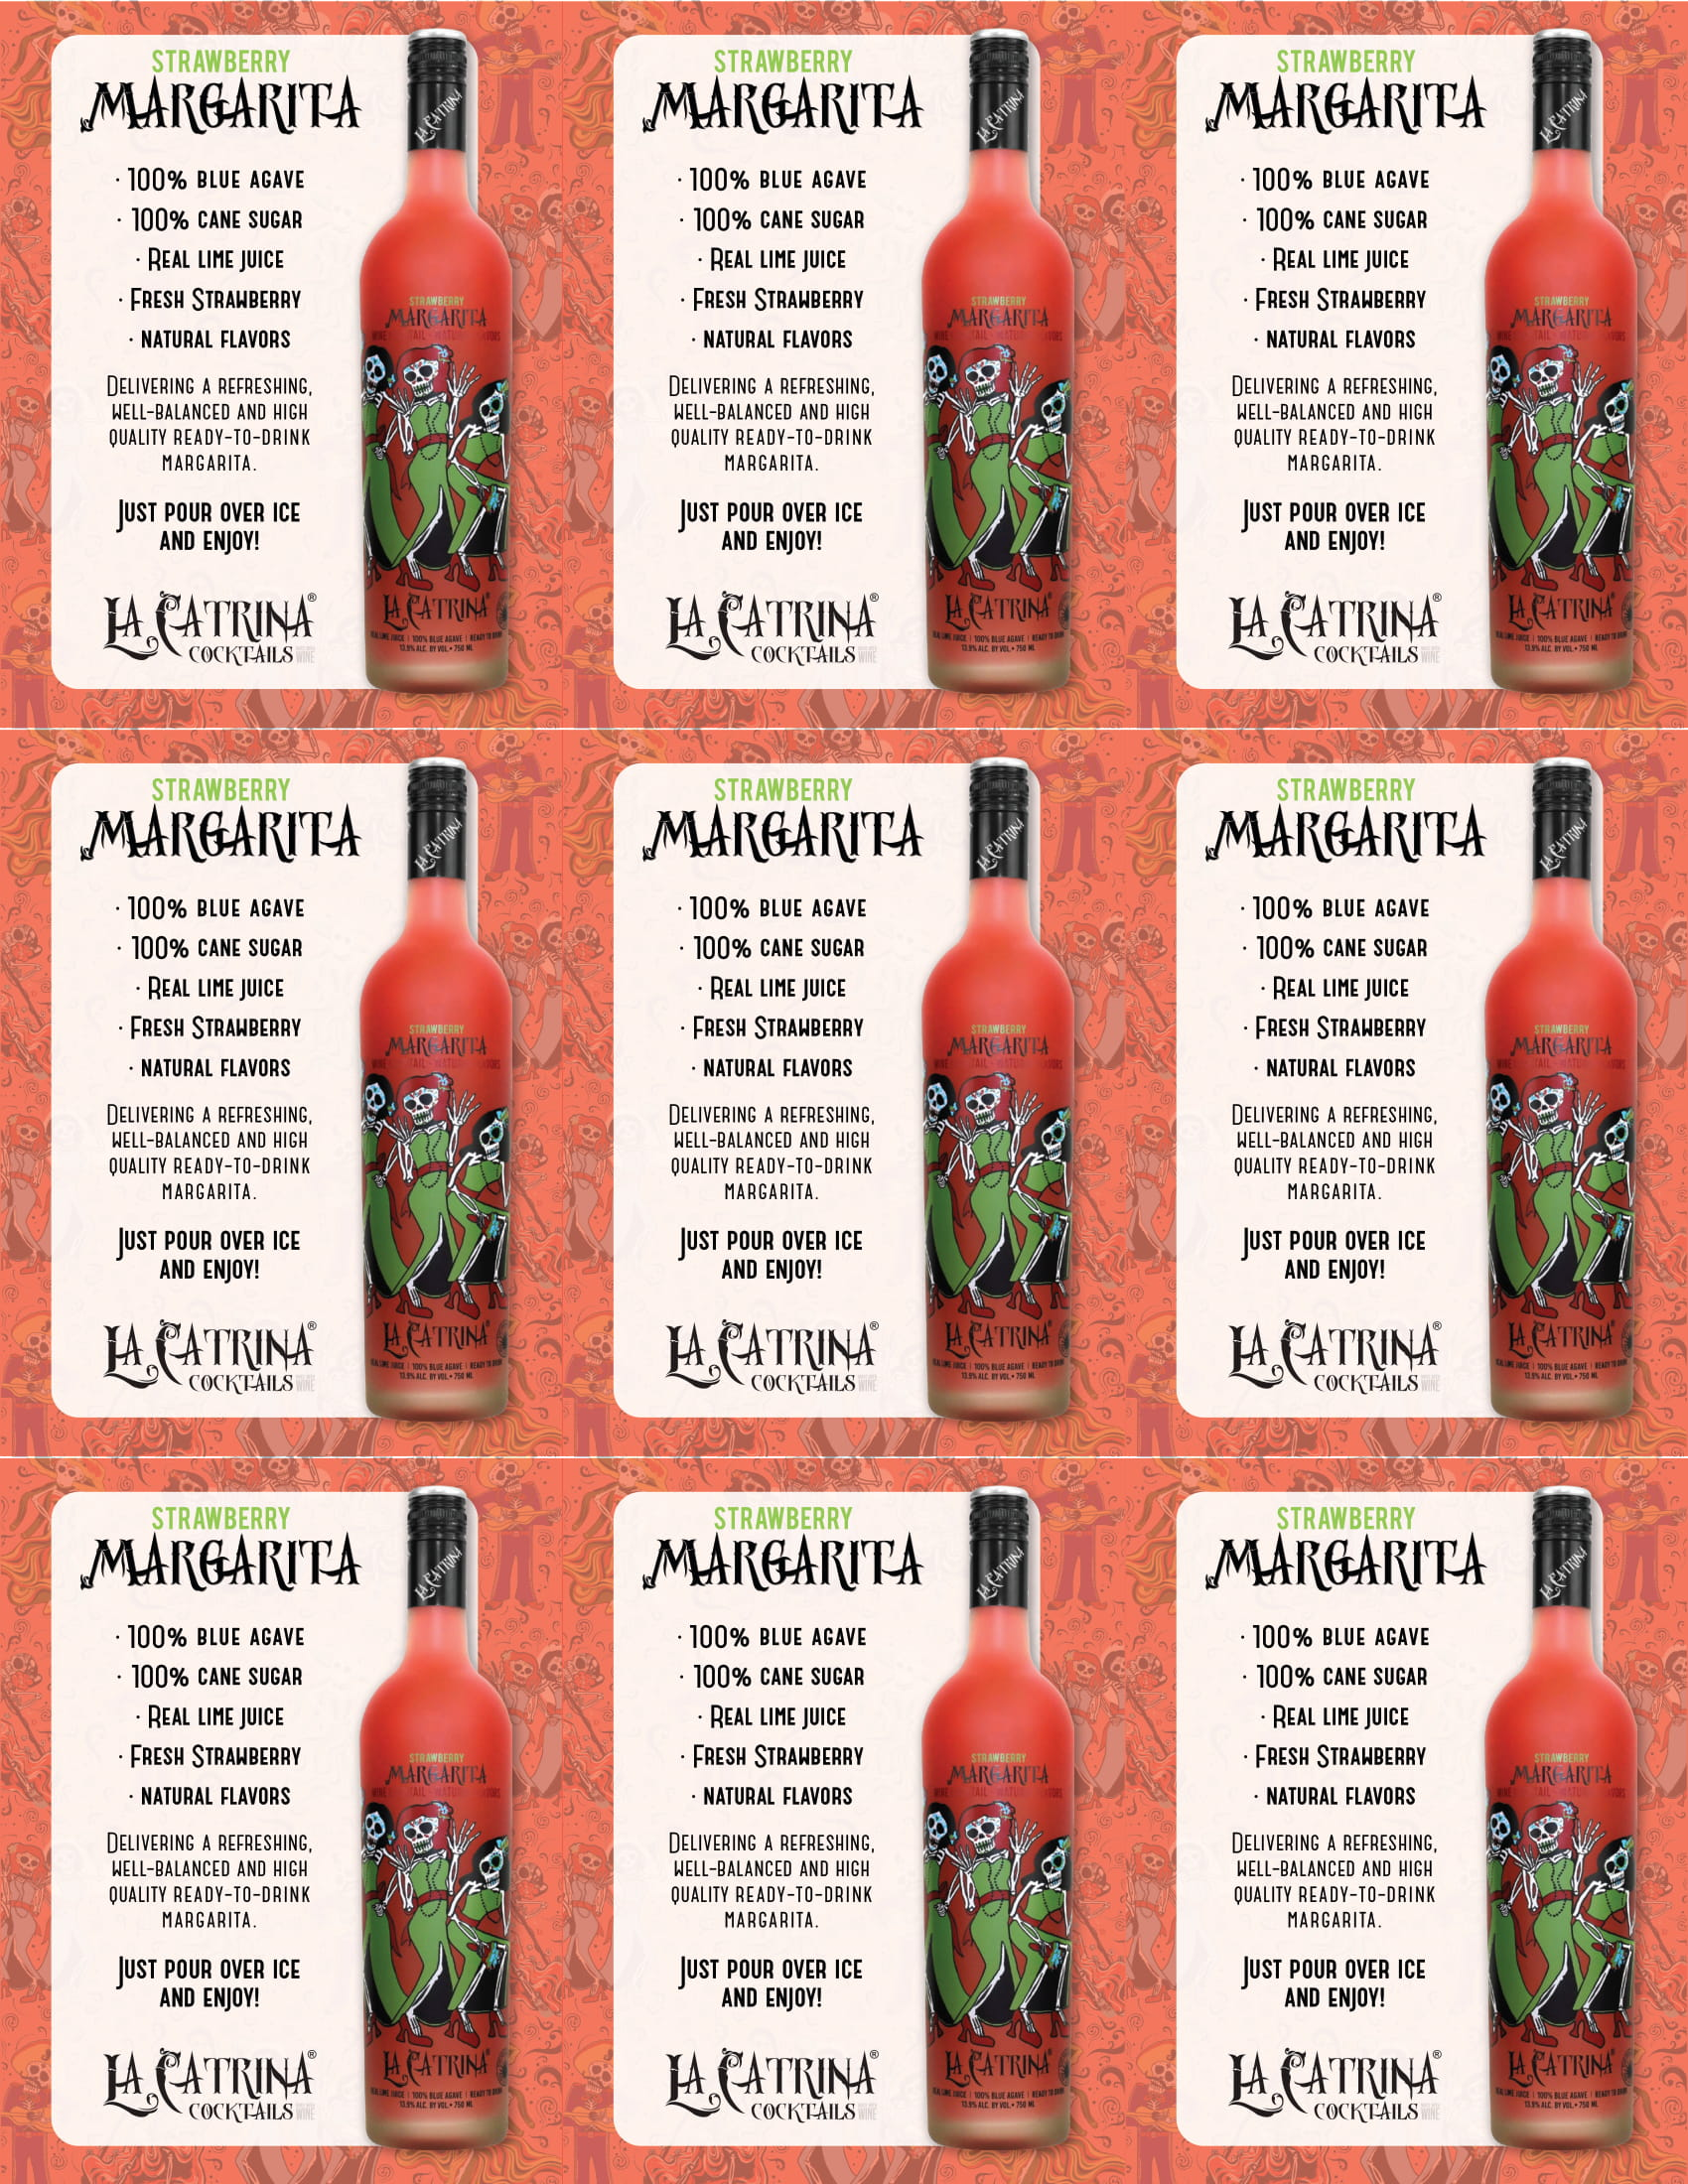 La Catrina Cocktails Strawberry Margarita Shelf Talkers